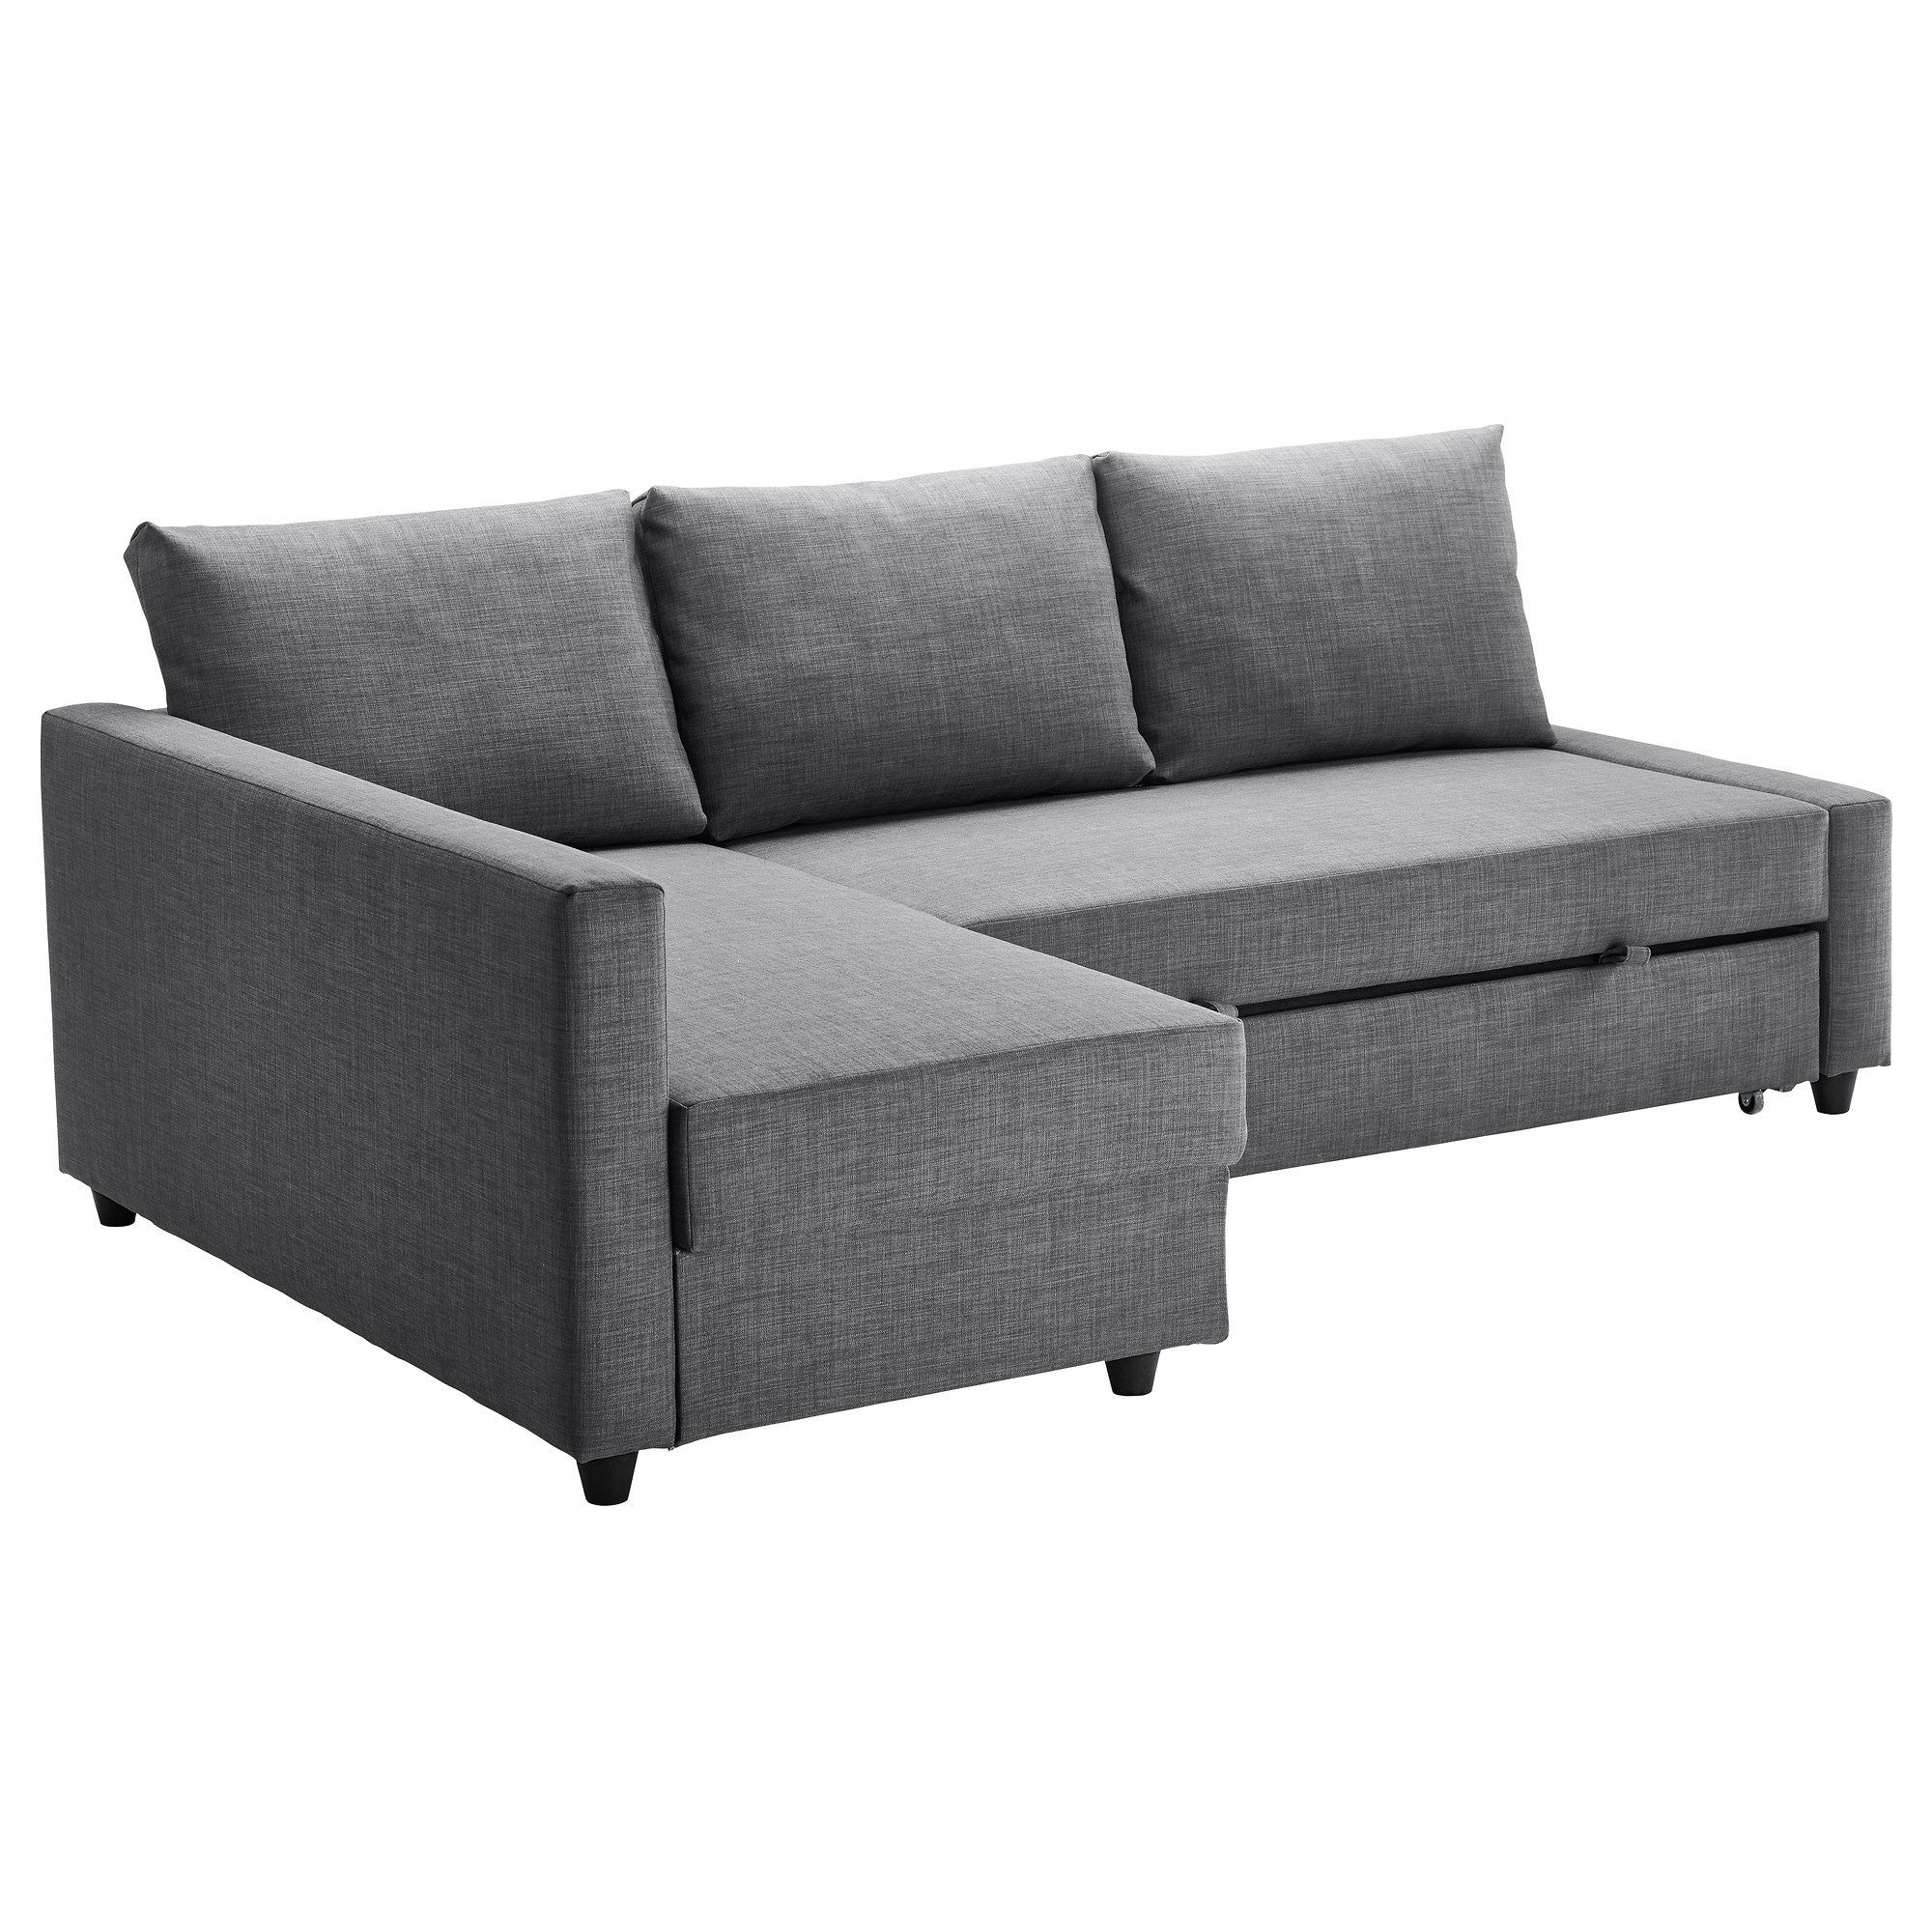 Sofa Relax Ikea U3dh sofas Armchairs Ikea